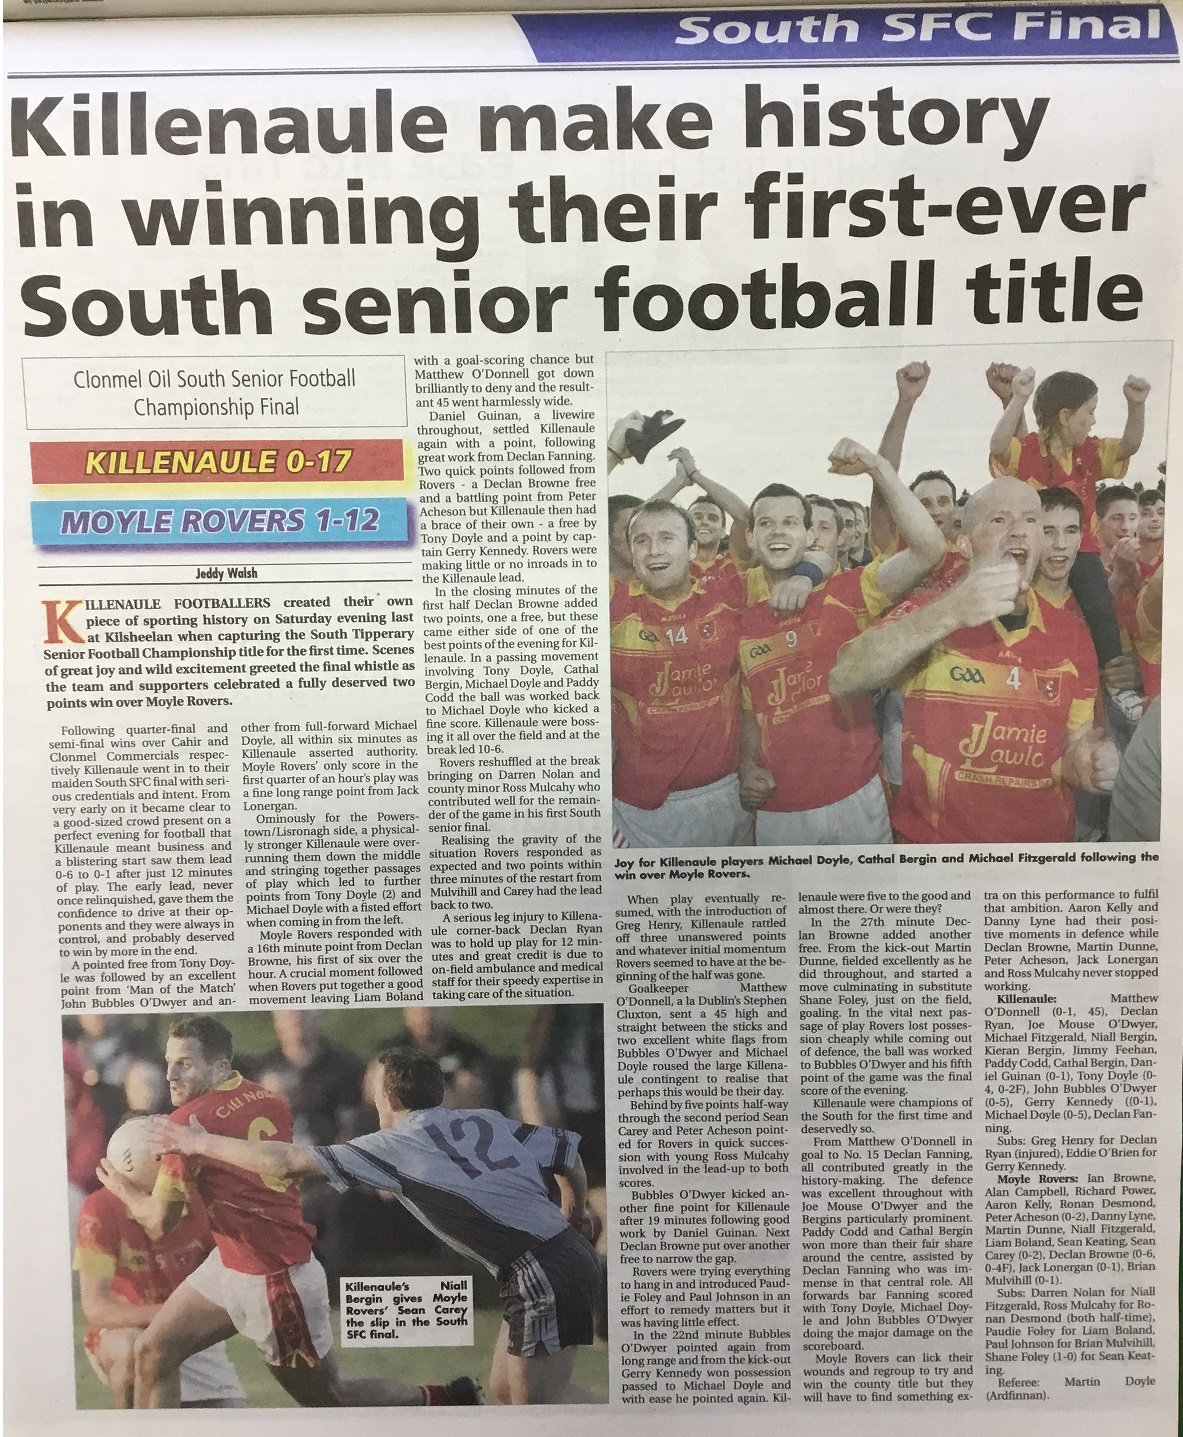 2012 South football final a